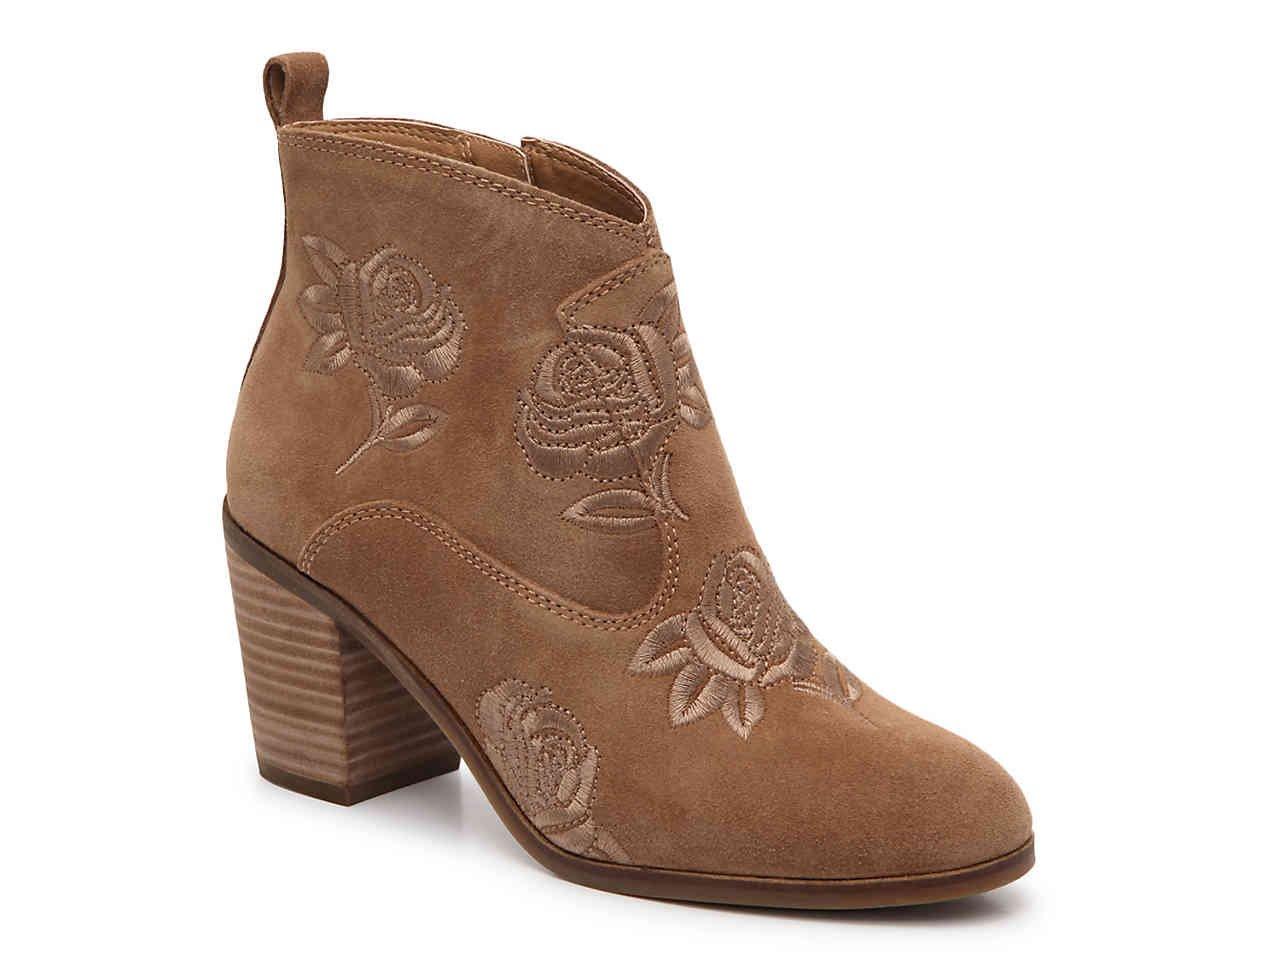 Lucky Brand Women's Pexton Ankle Boot B07693LRN6 10 B(M) US|Sesame